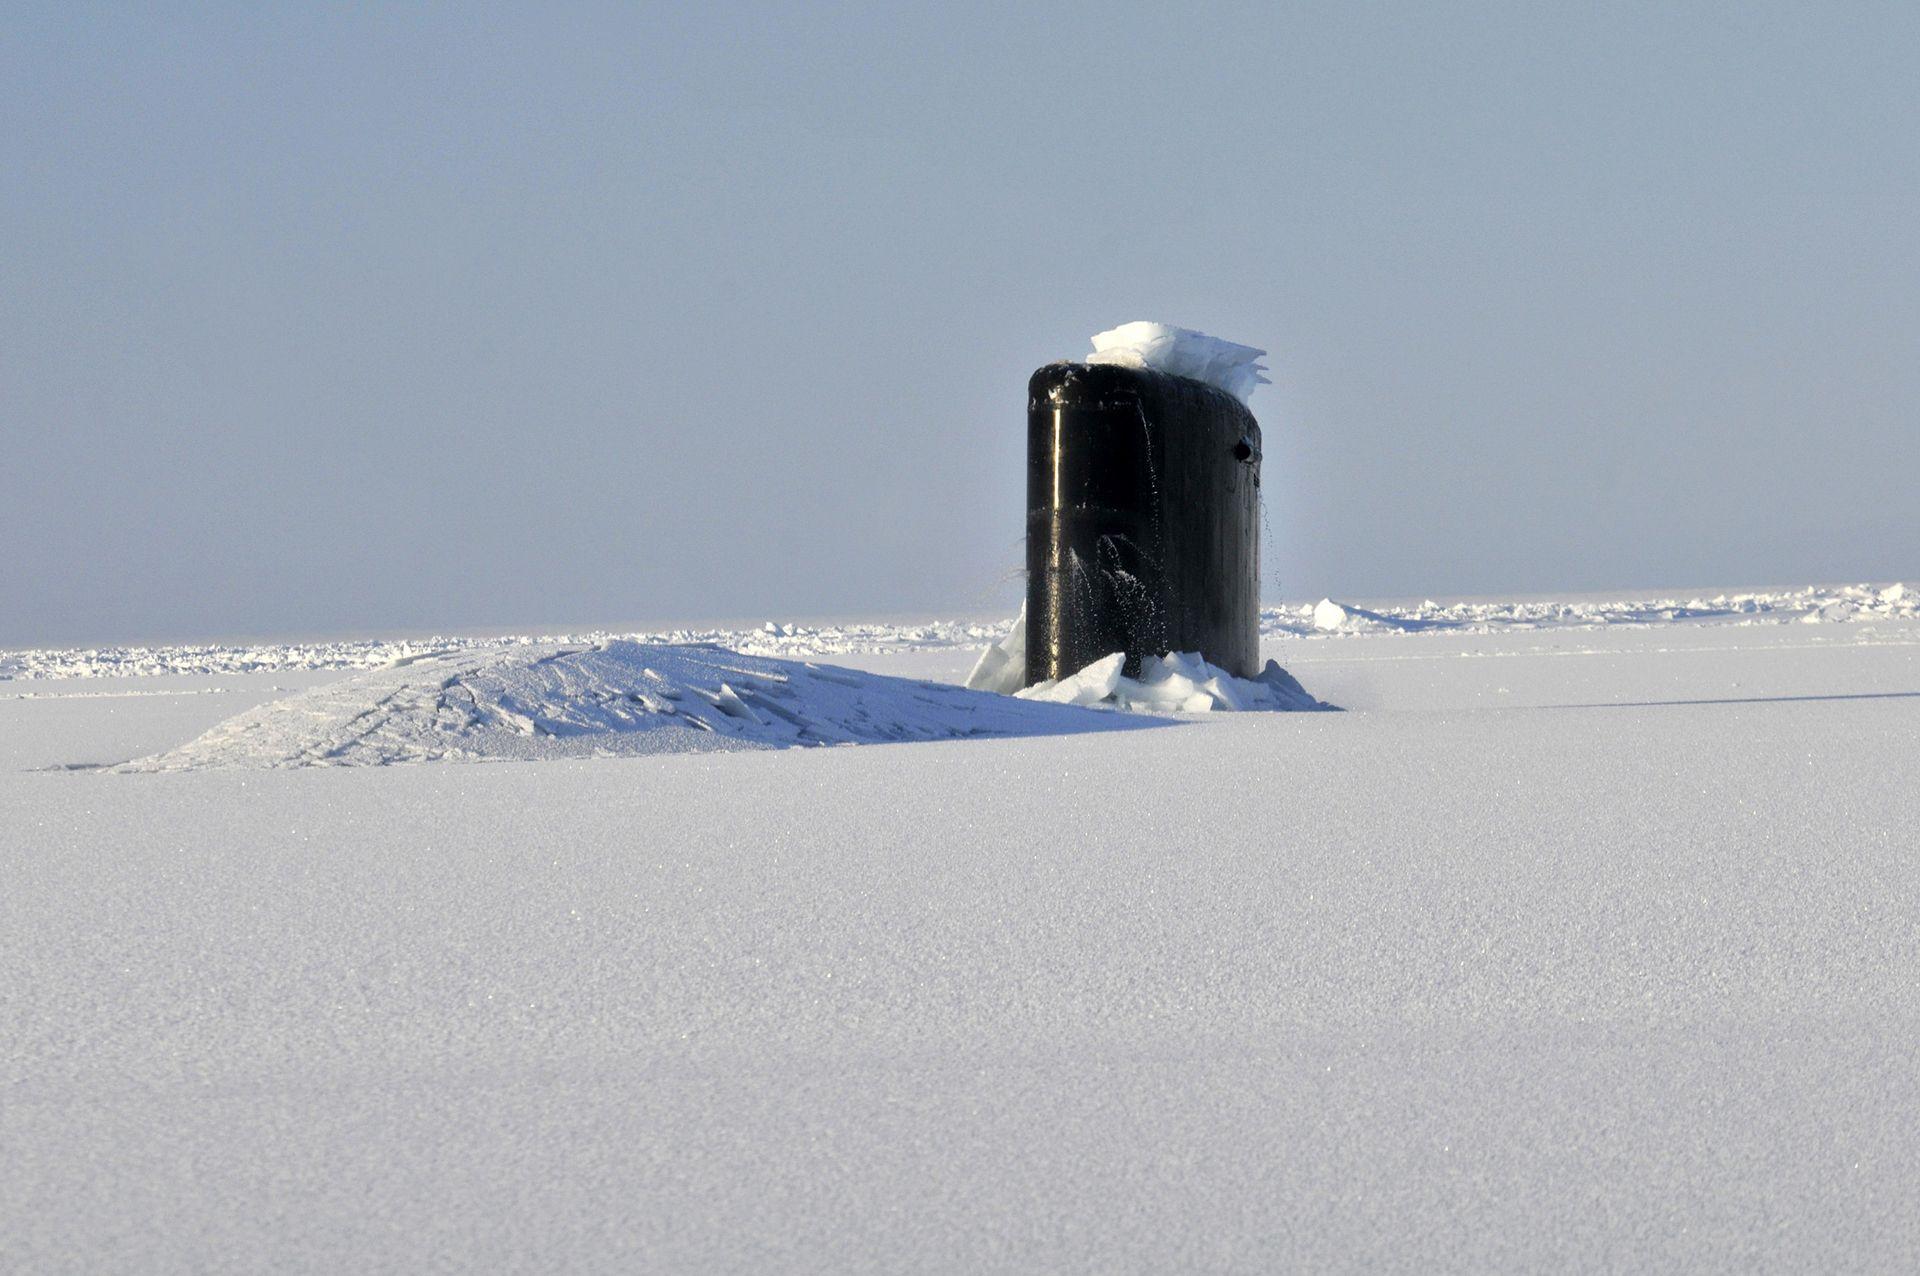 Parvati Foundation Submarine Arctic No Attribution